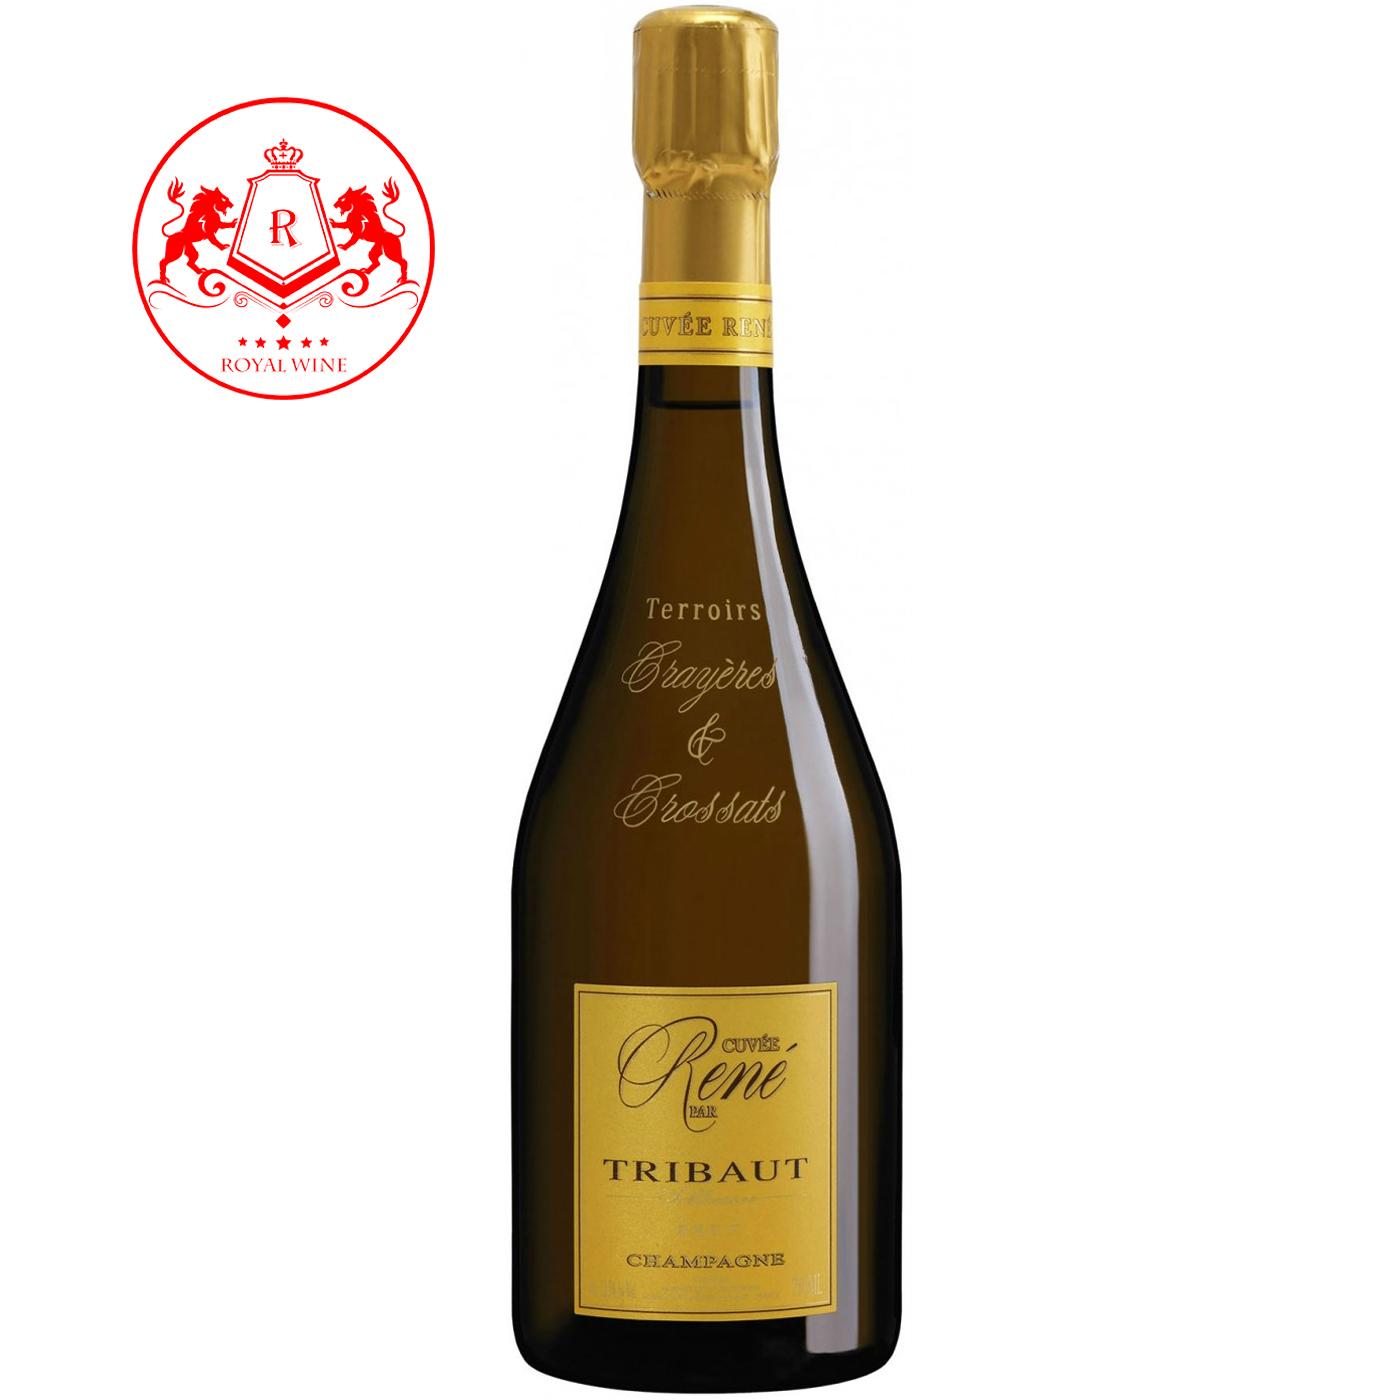 Champagne TRIBAUT SCHLOESSER Cuvee Rene